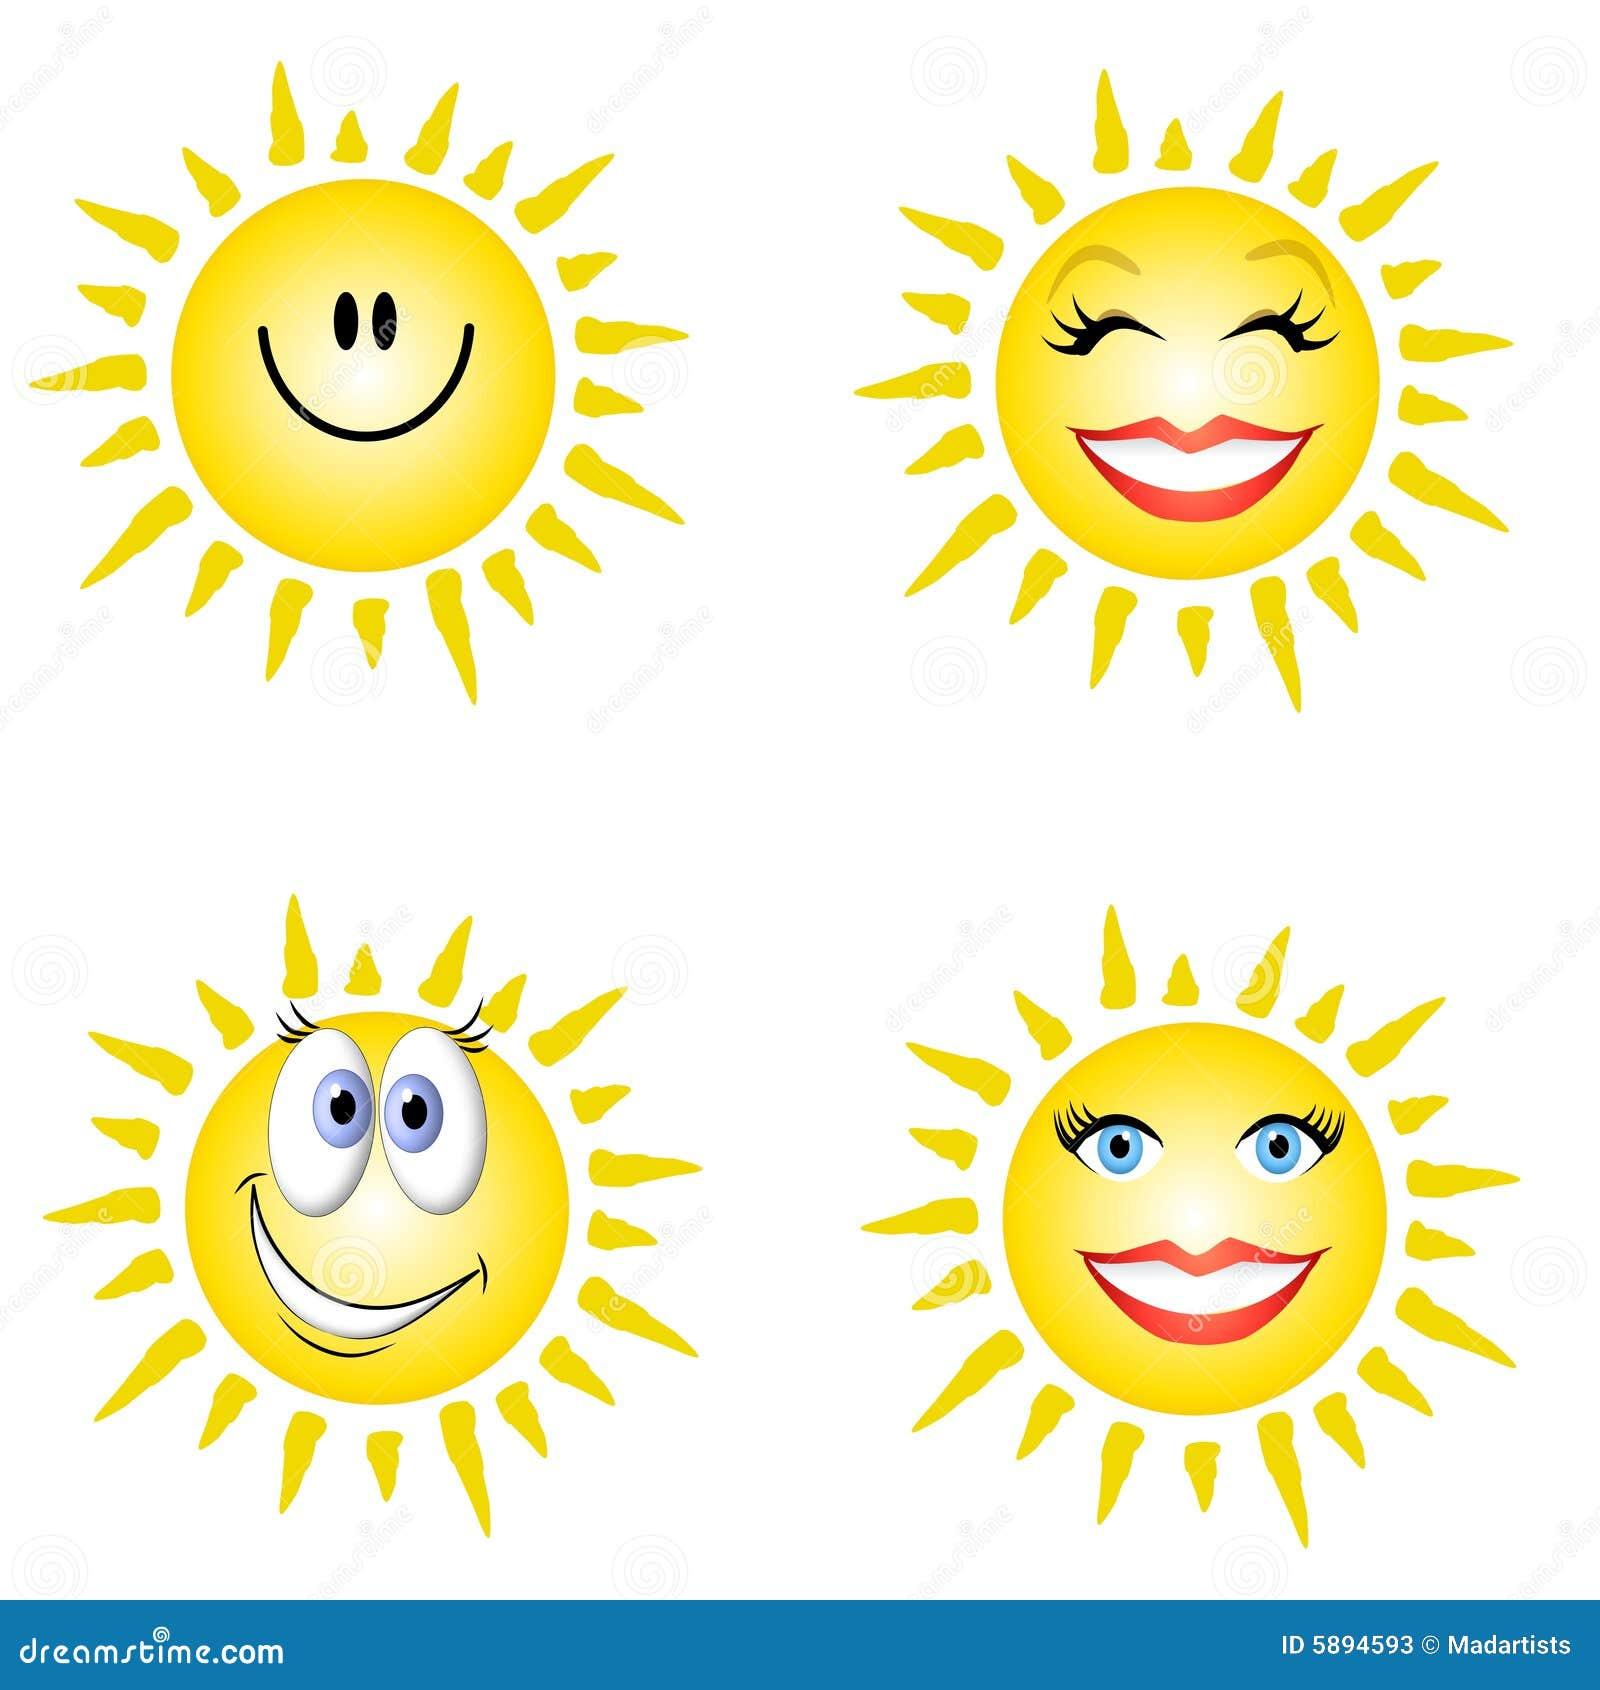 sunshine smiley faces stock illustration illustration of Cartoon Smiley Face Clip Art Flower Smiley Face Clip Art